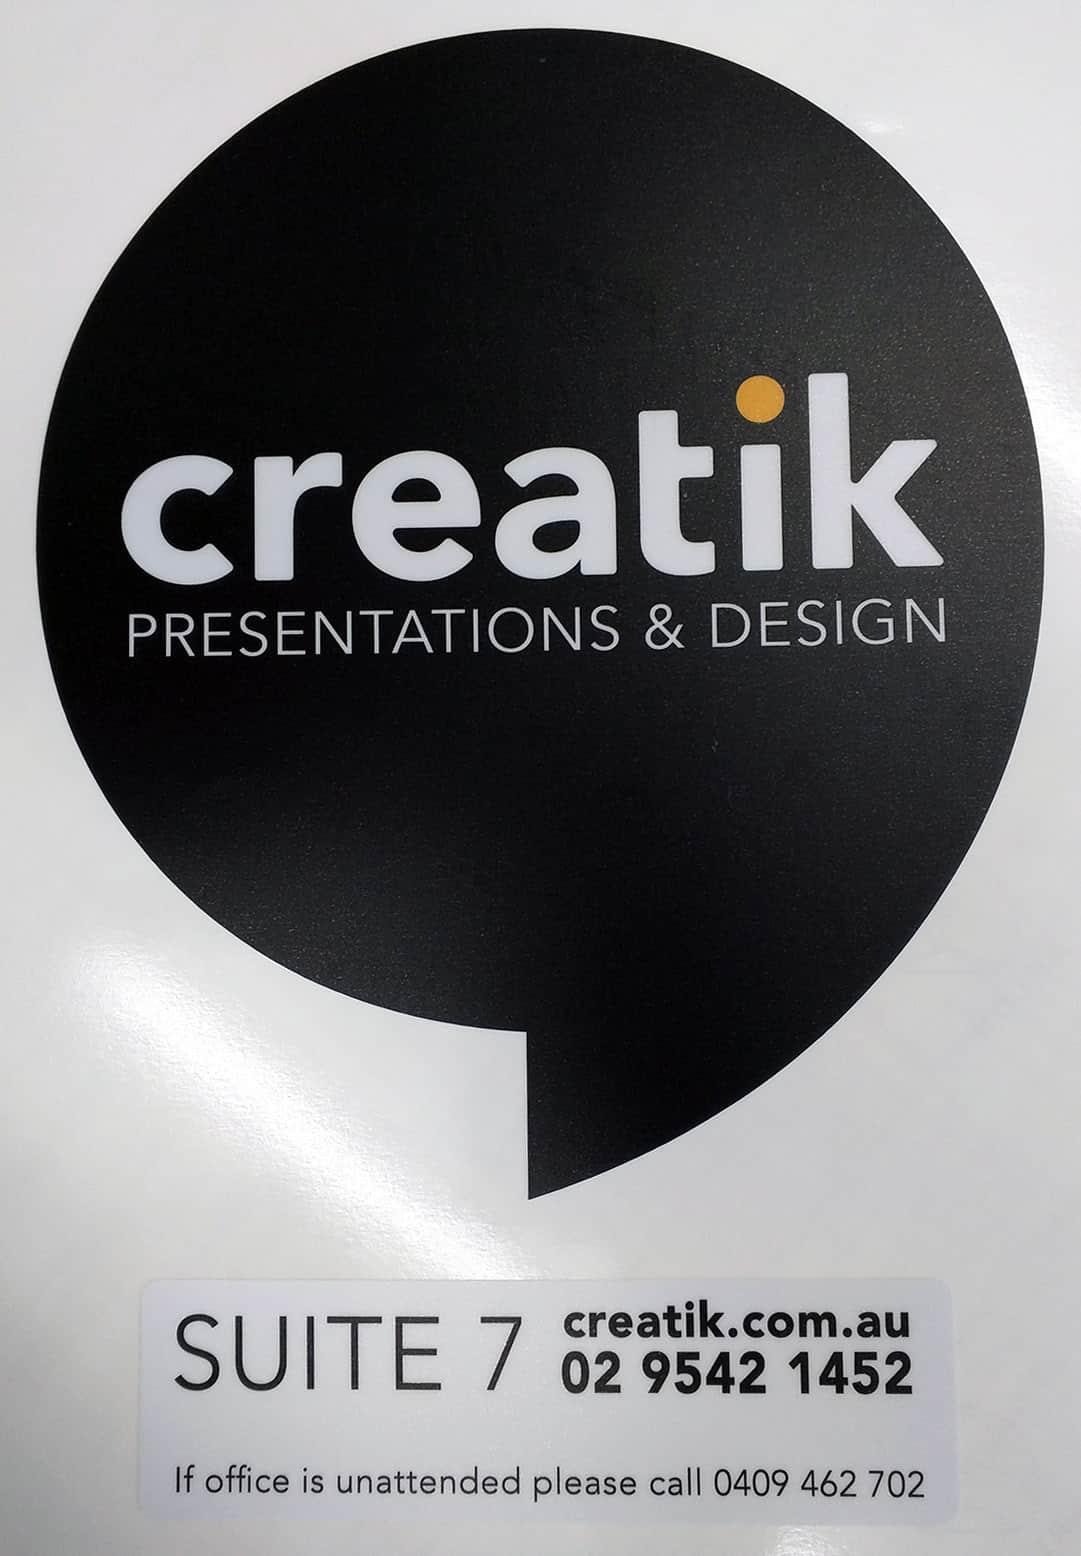 2016 06 creatik presentations and designs sydney new south wales custom office glass door sticker matte laminated